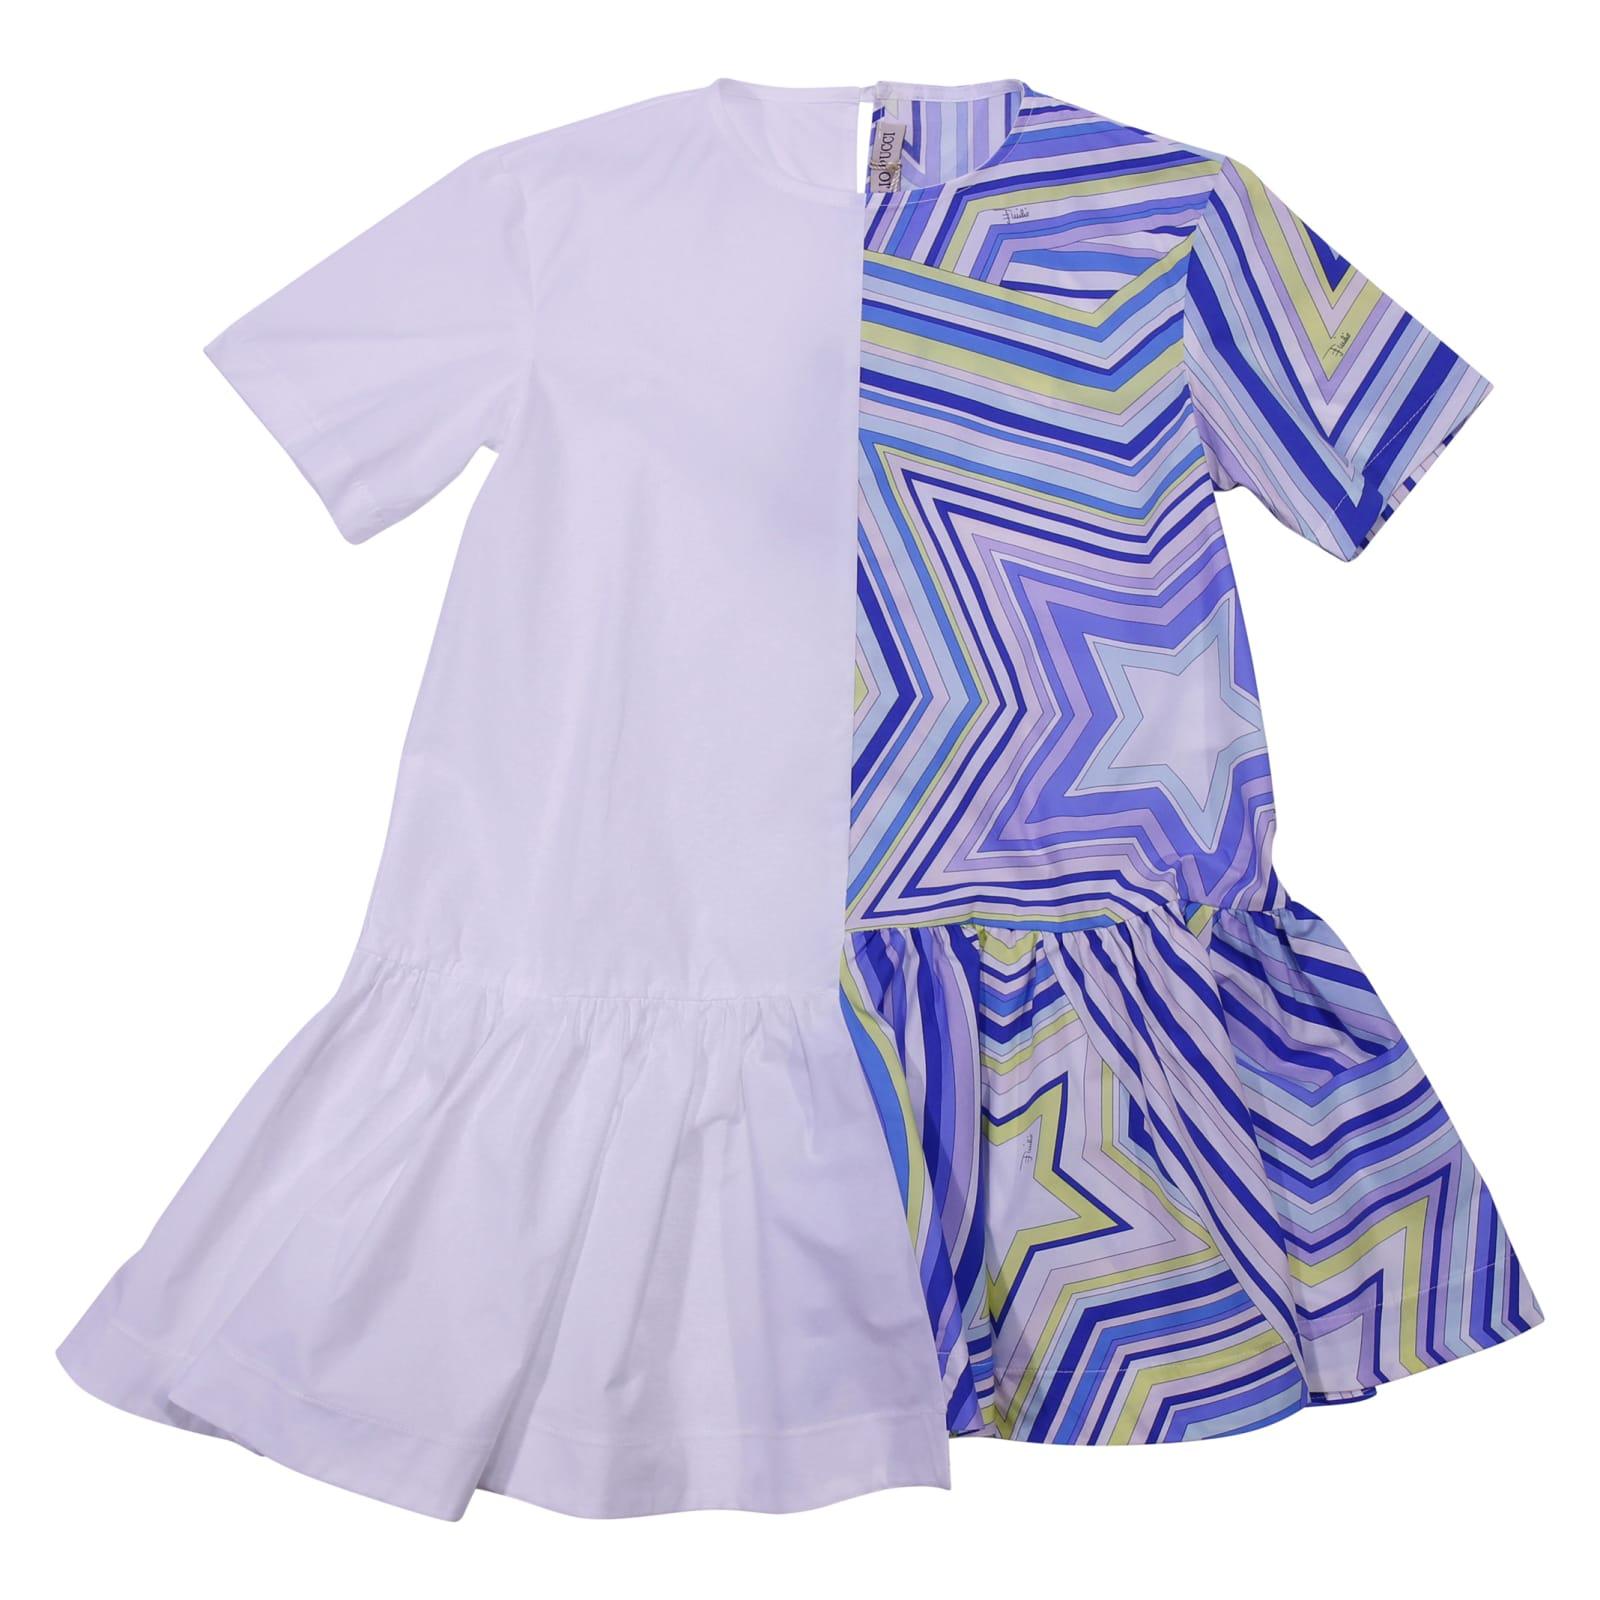 Emilio Pucci Printed Cotton Poplin Dress